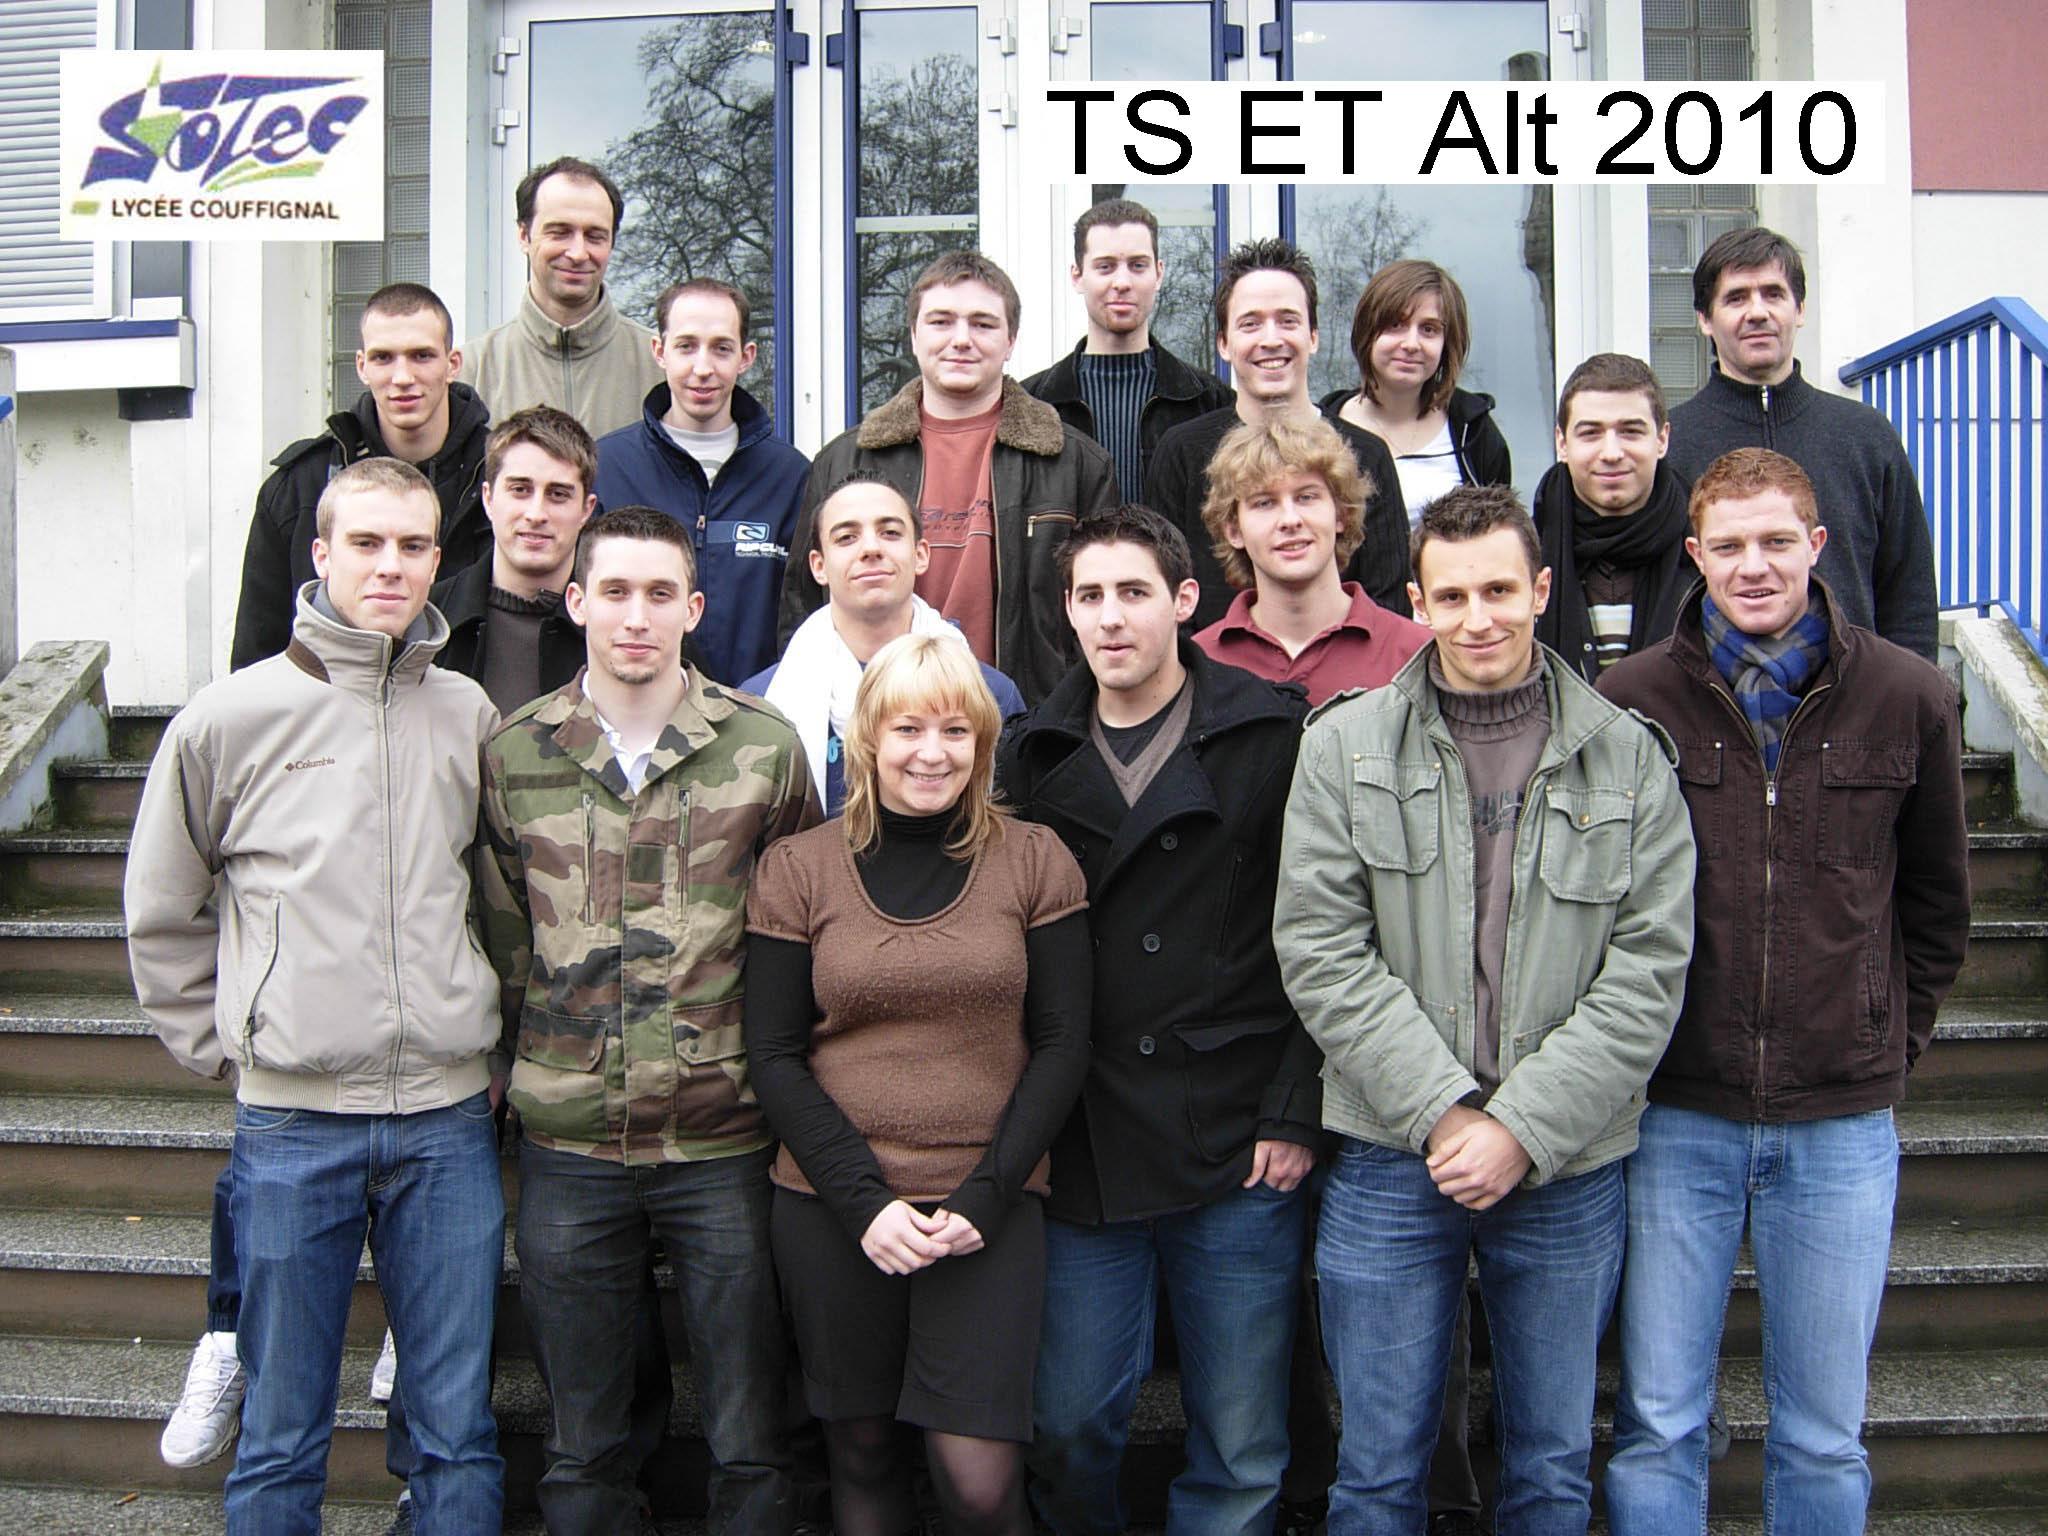 TS_ETAlt.jpg